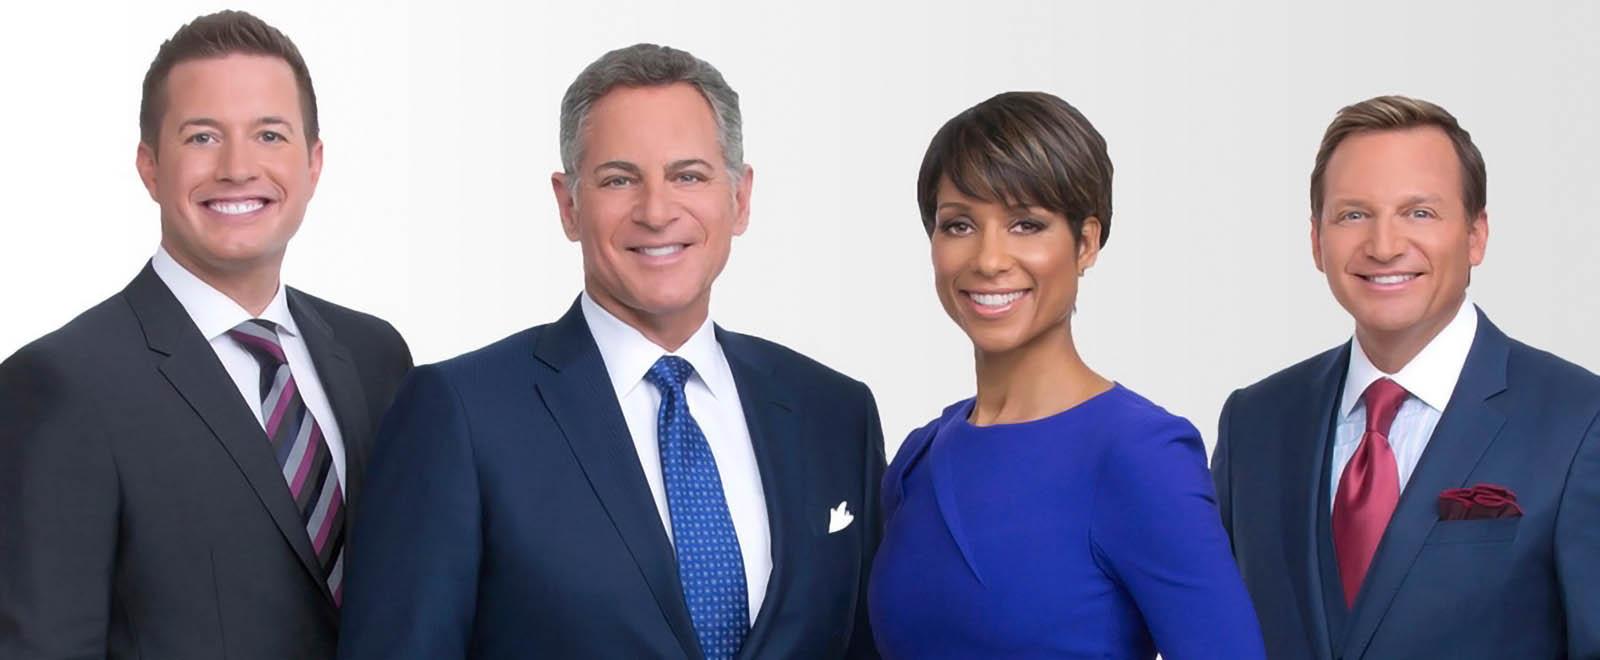 WABC TV Eyewitness News team